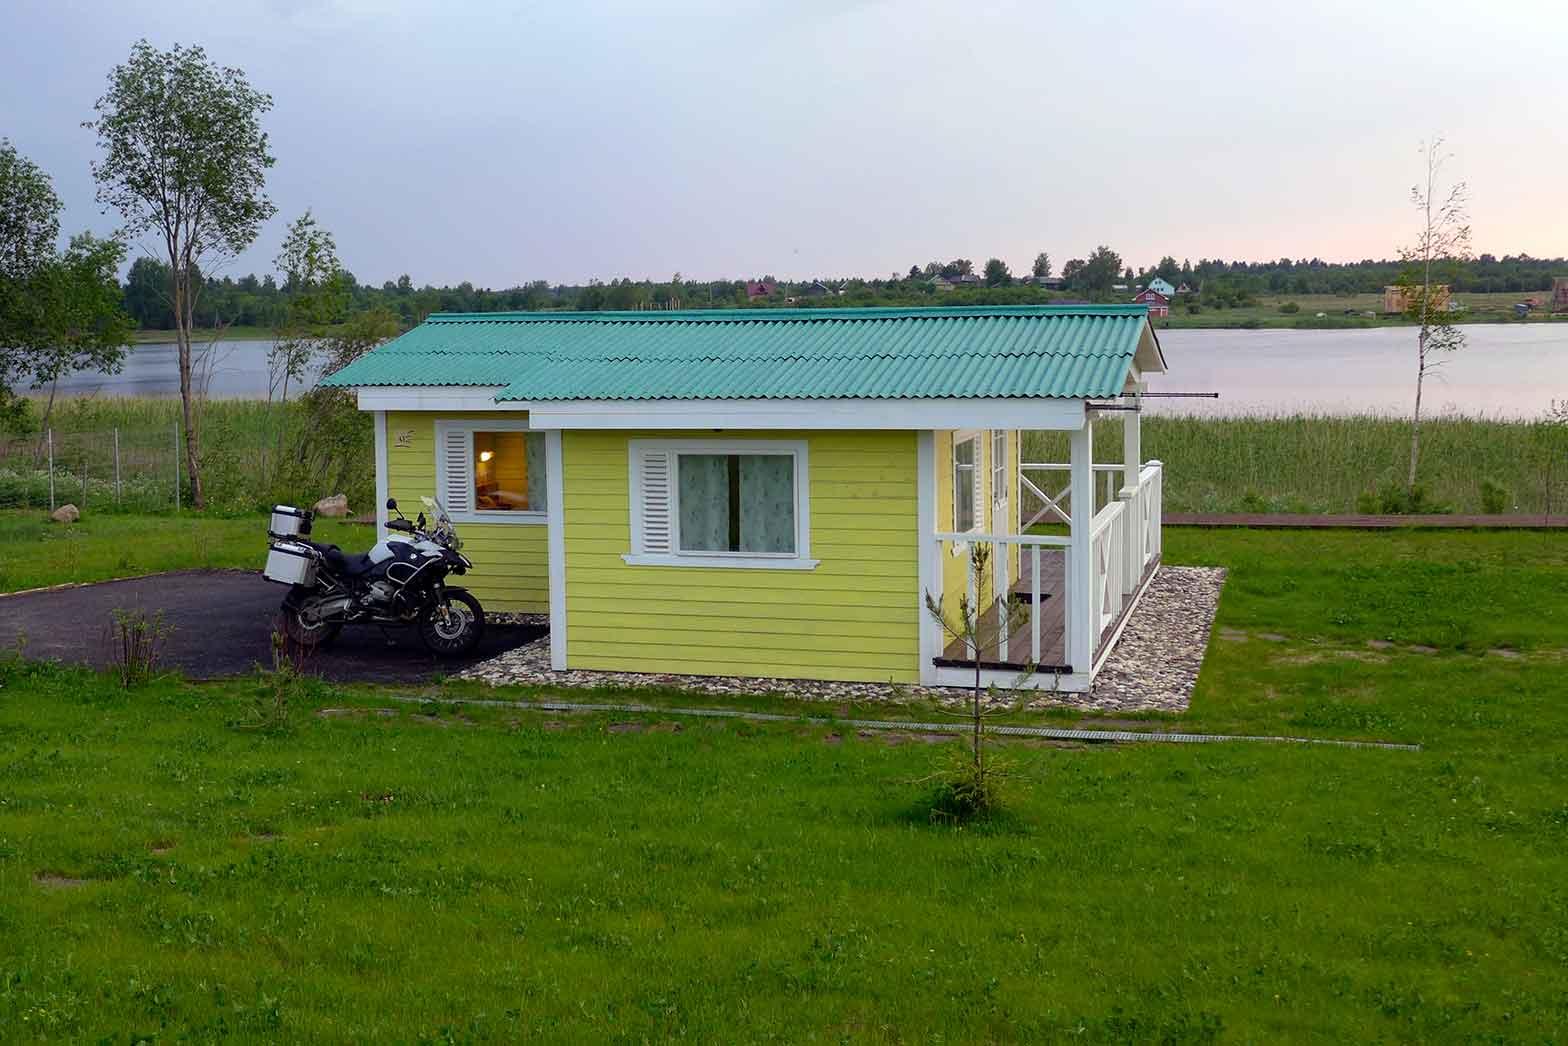 Laituri cabin